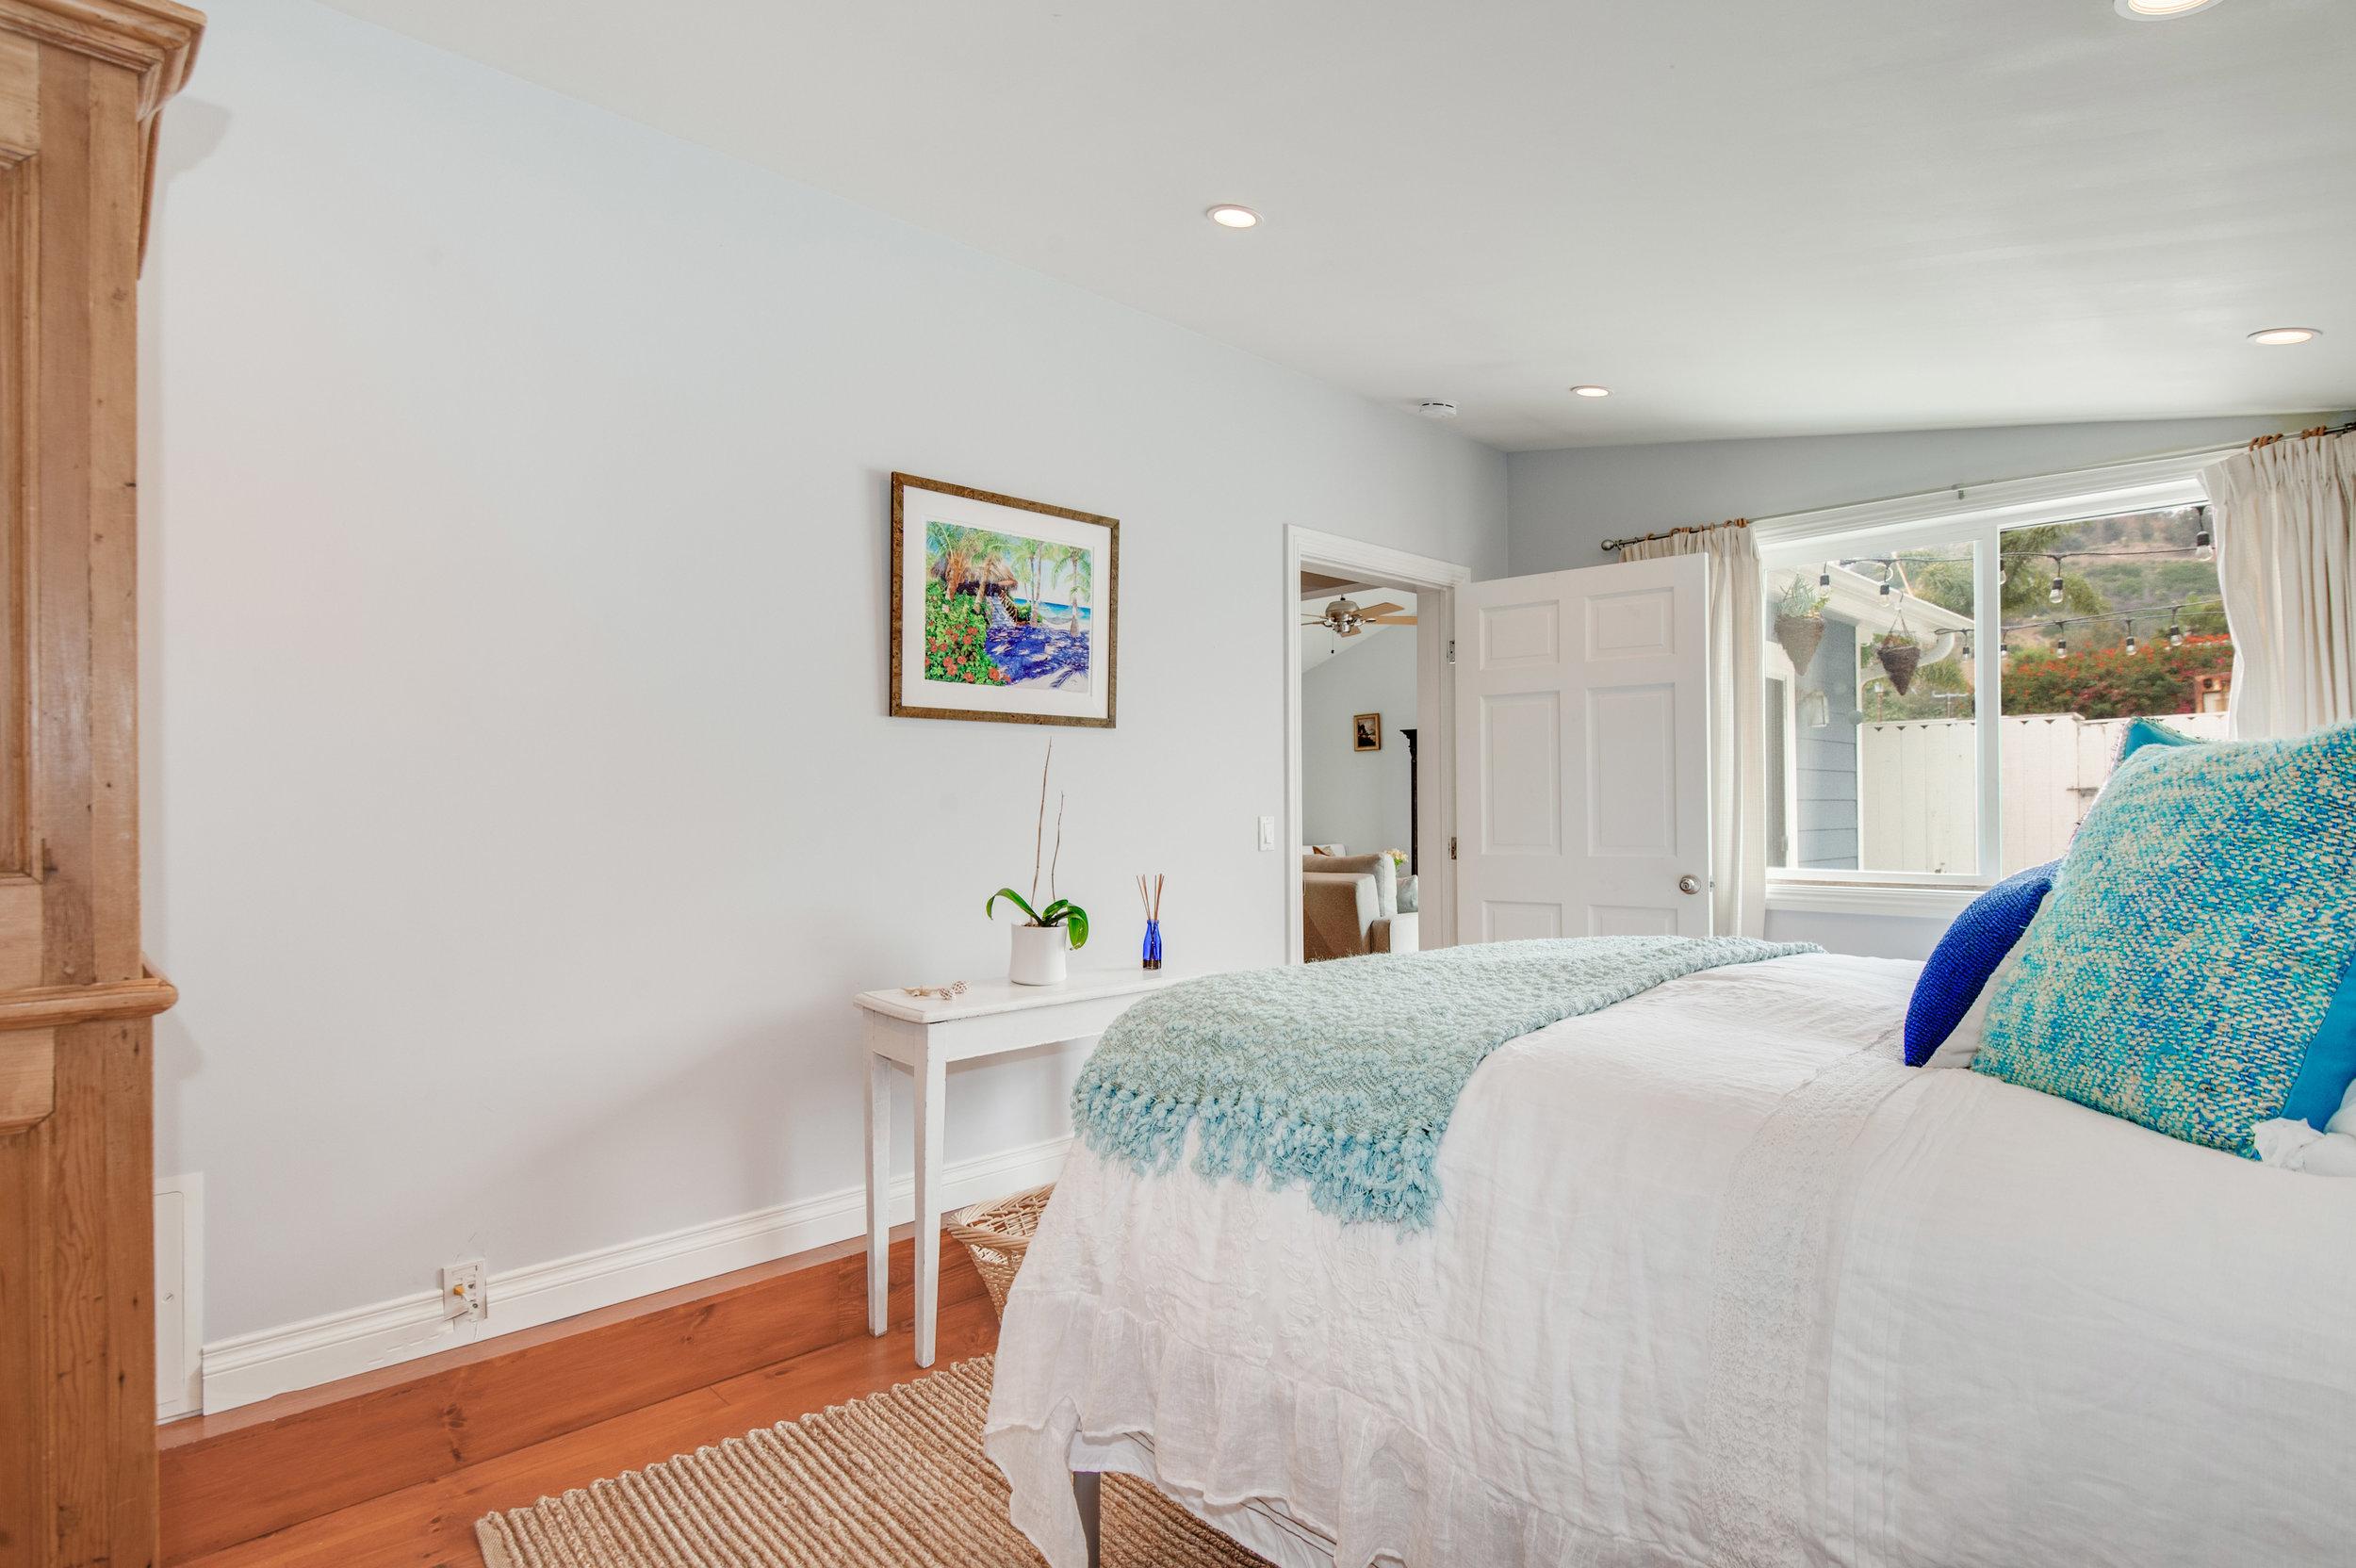 010 Bedroom 3950 Las Flores For Sale Lease The Malibu Life Team Luxury Real Estate.jpg